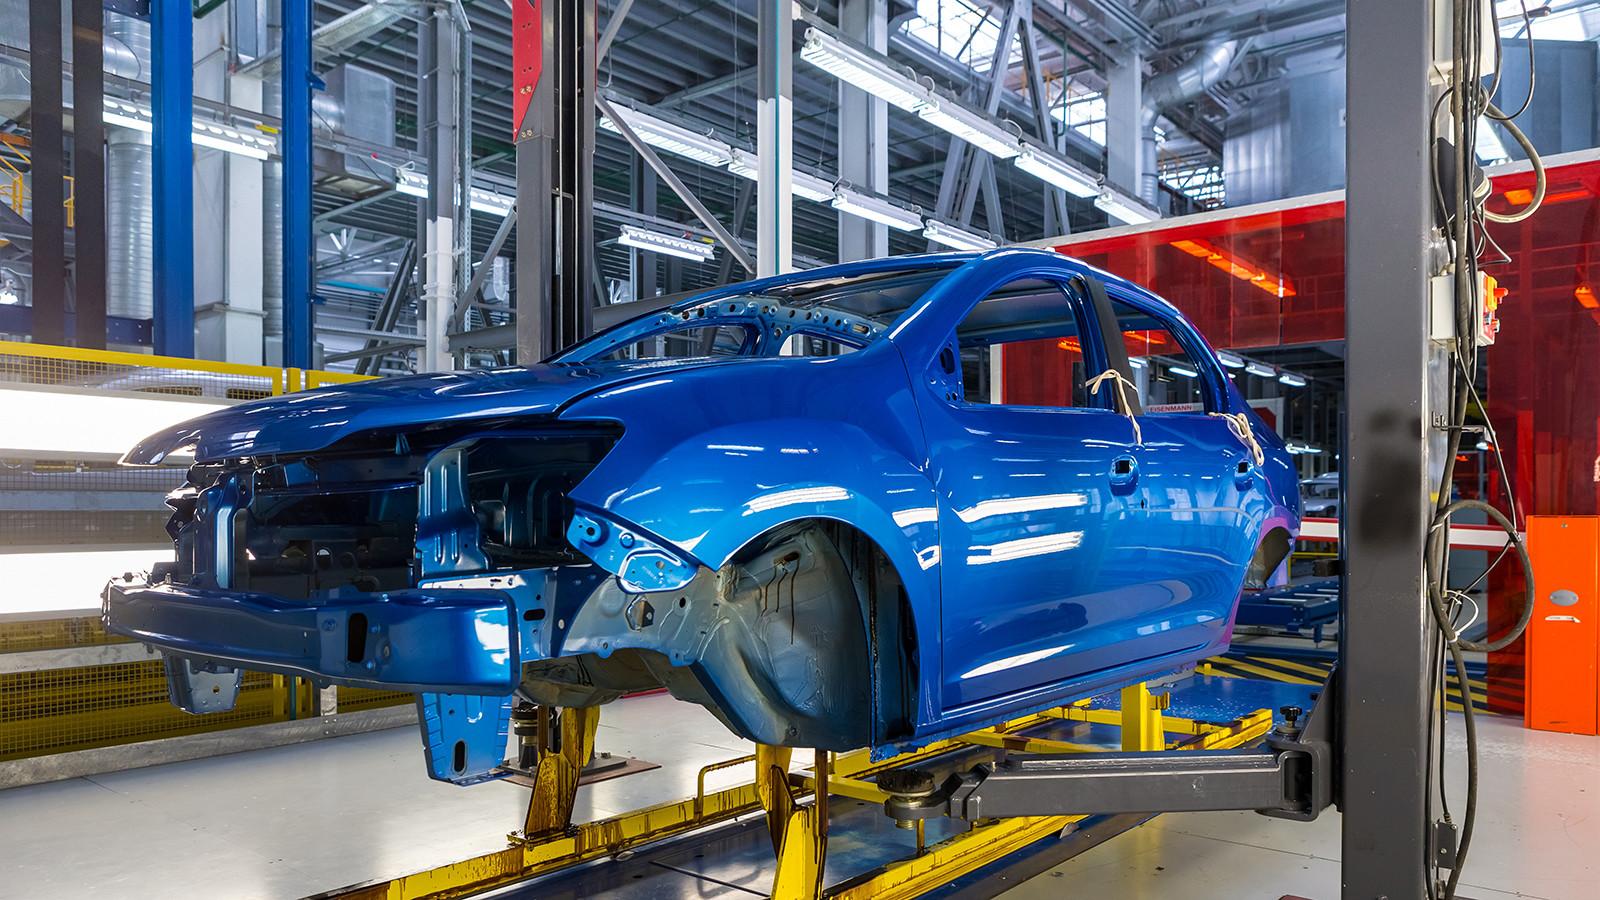 Русские представители реализовали 1,5 млн. авто Рено